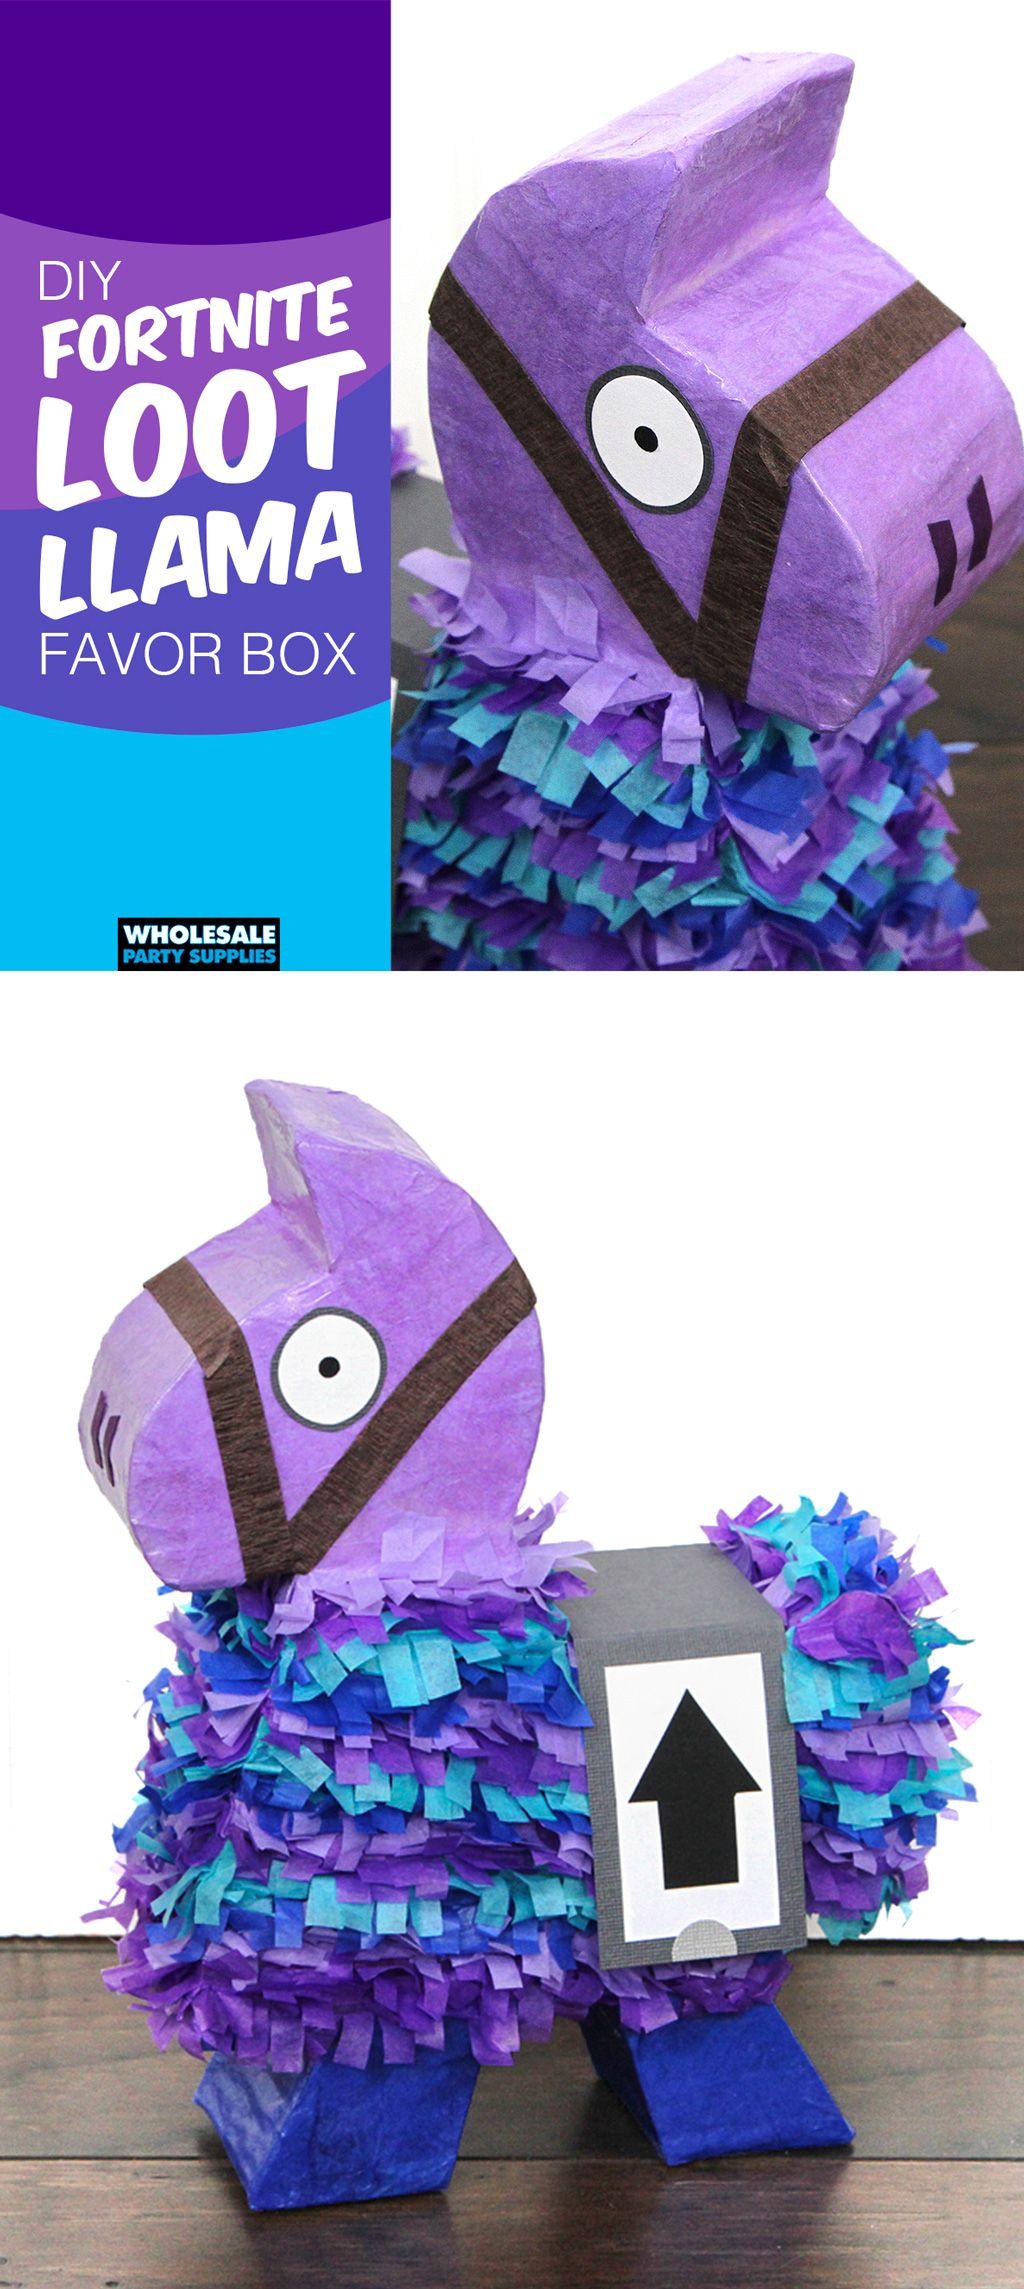 Diy loot llama favor box valentine day boxes valentine